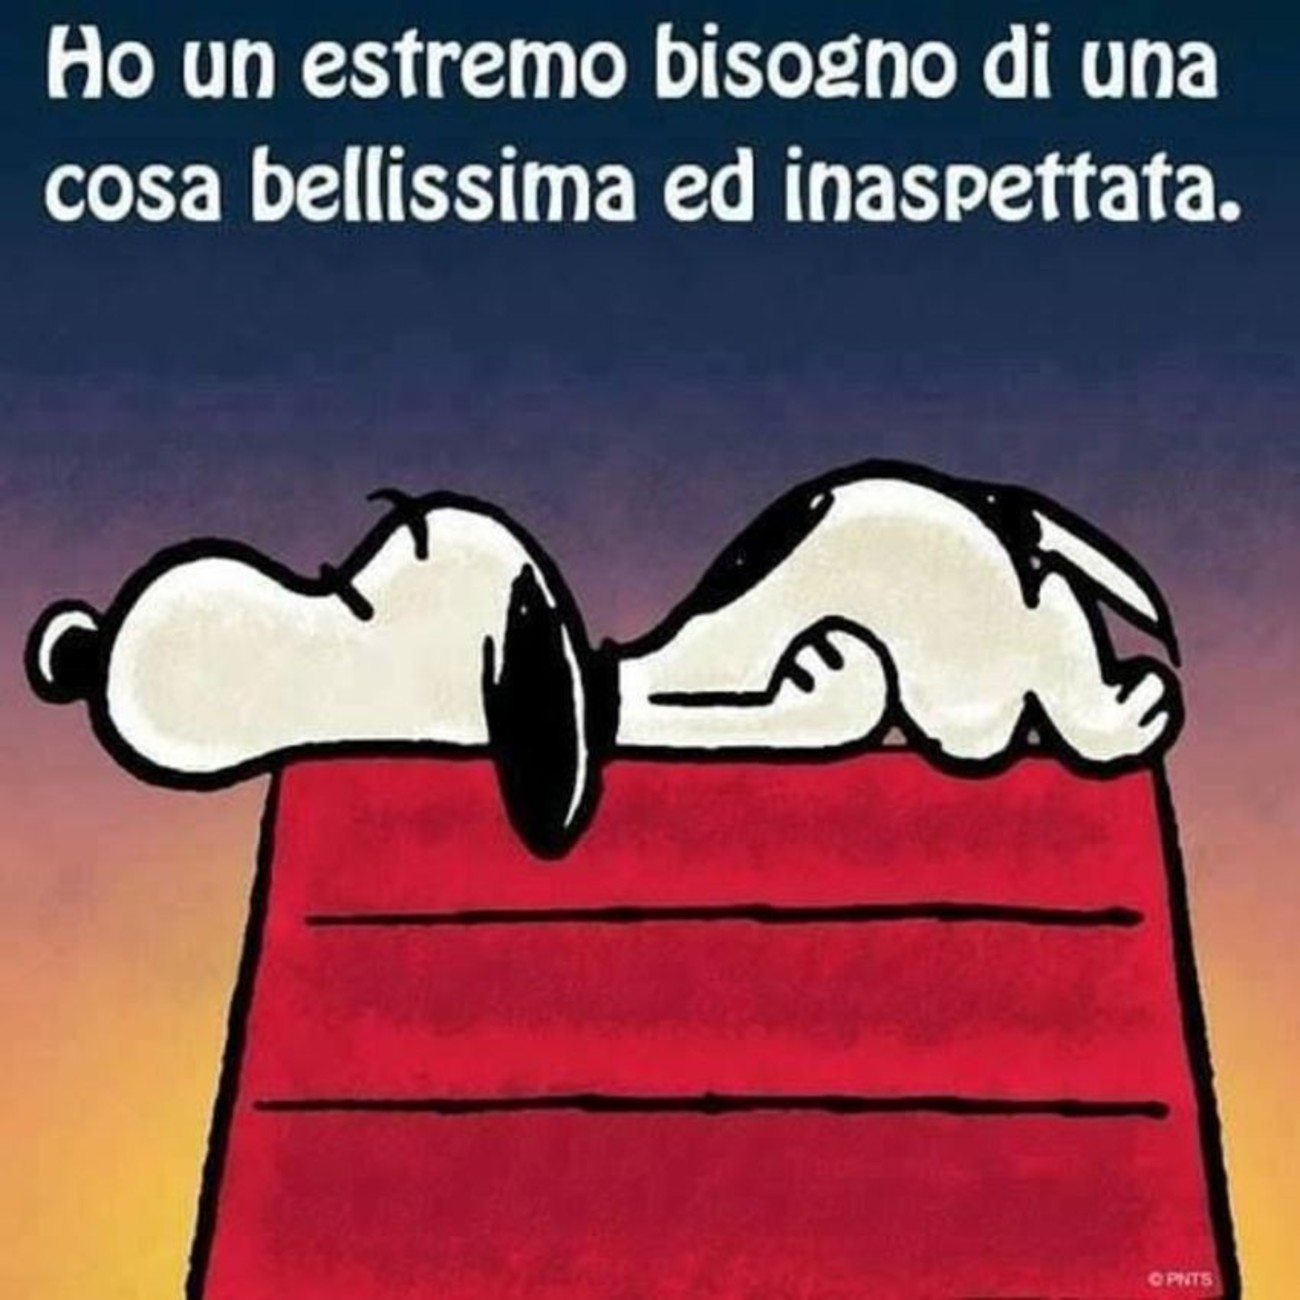 Snoopy Vignette Immaginifacebook It